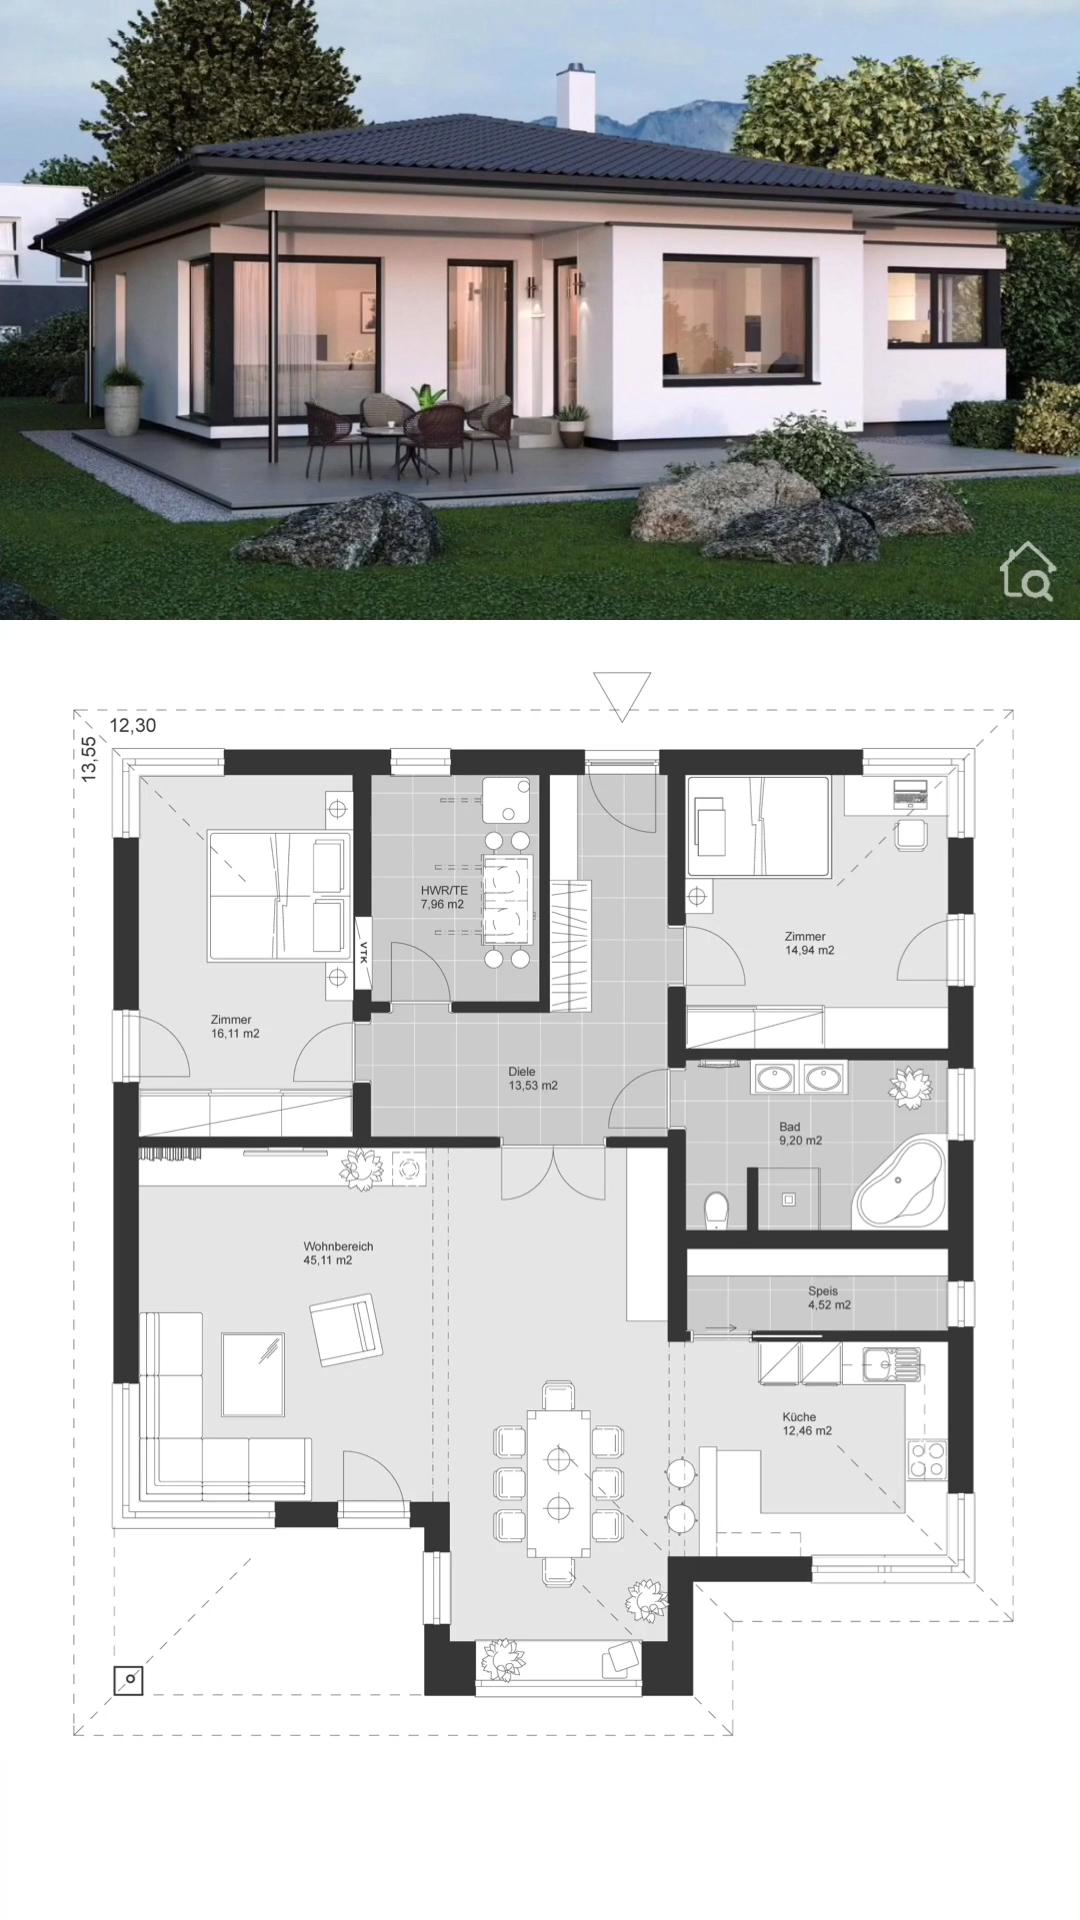 Bungalow House Modern European Architecture Floor Plans & Interior Design Ideas